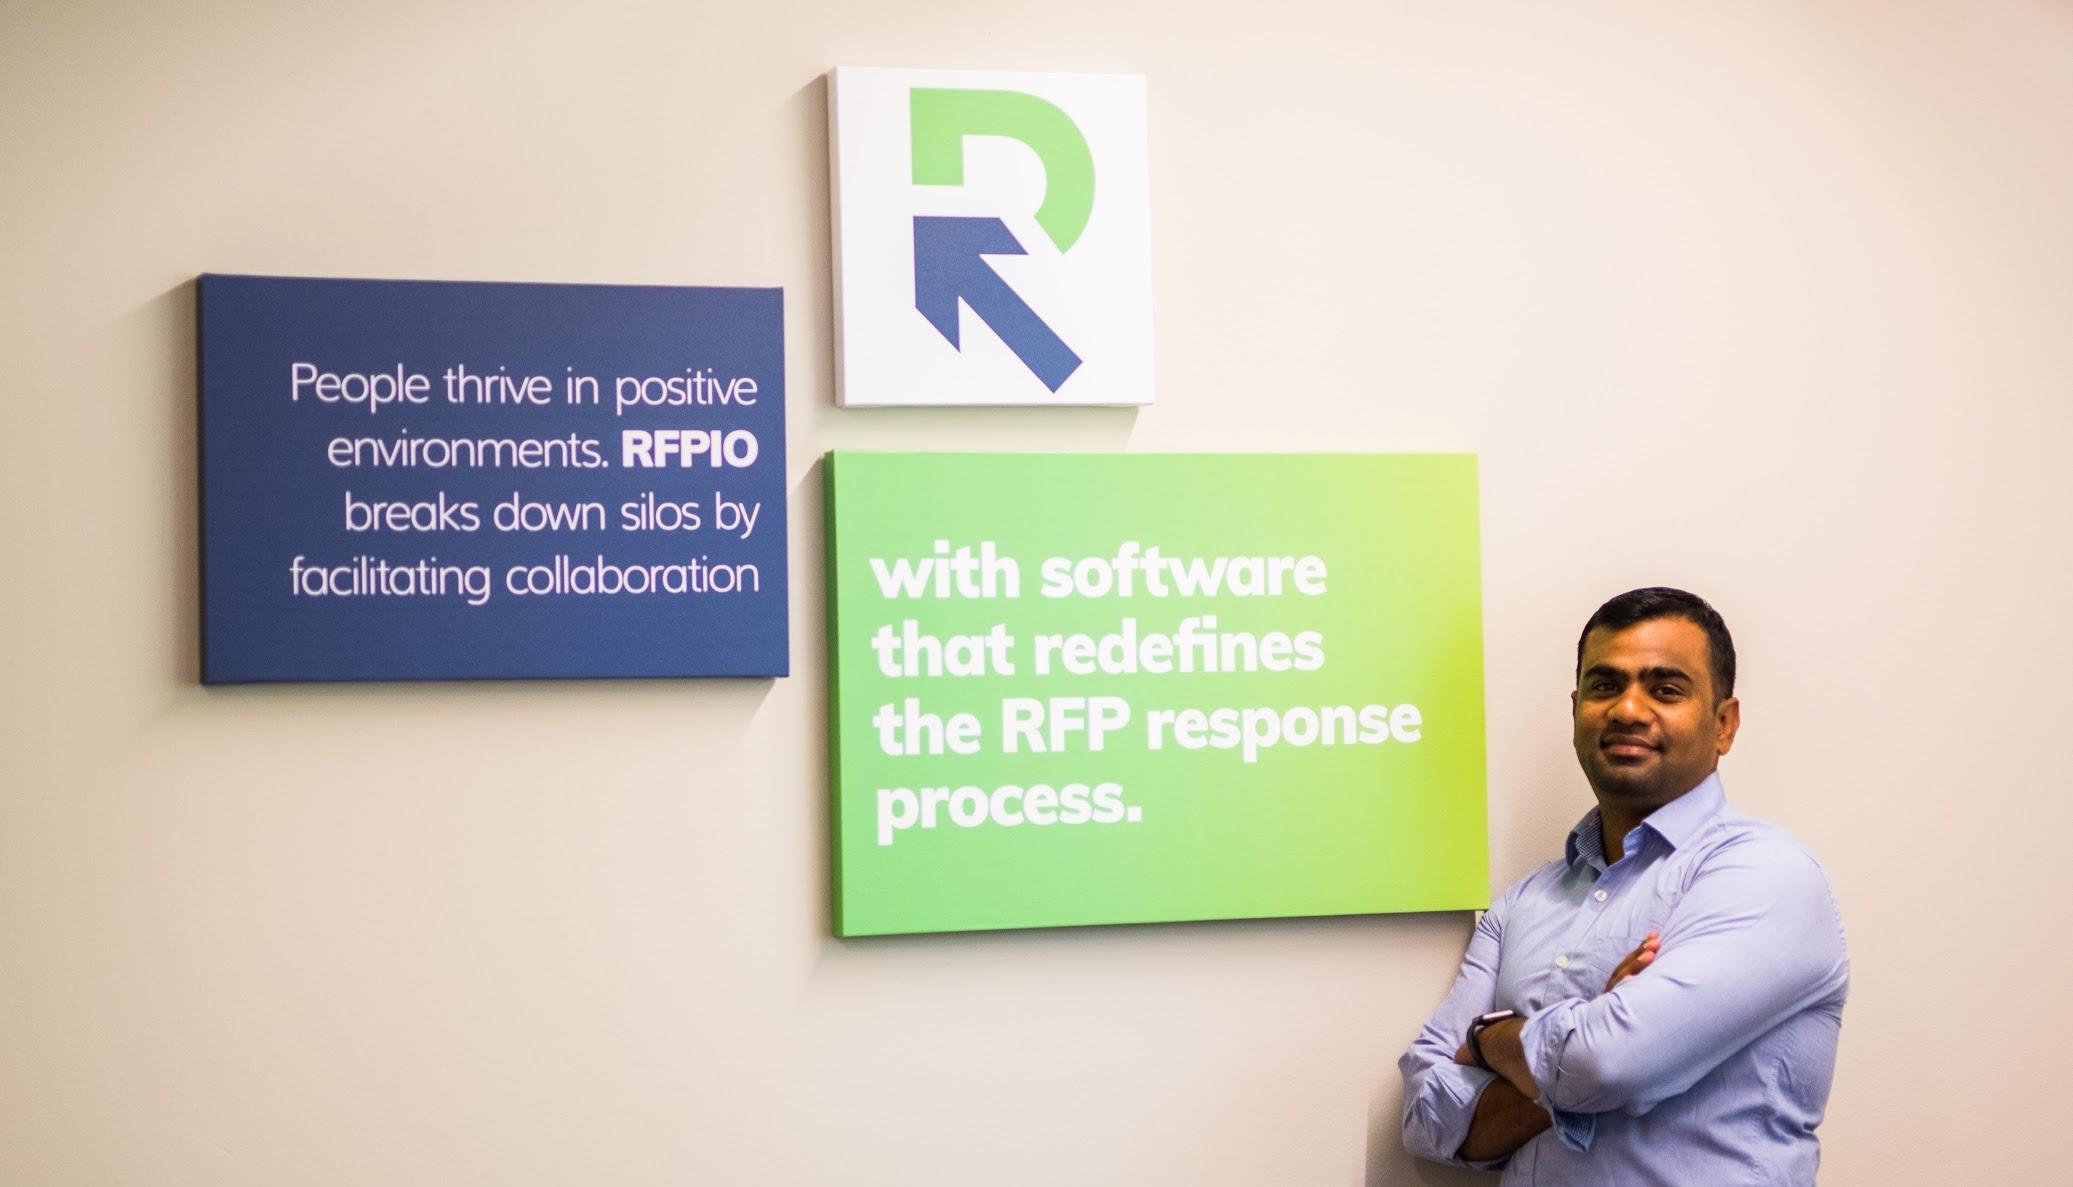 Image Courtesy of RFPIO